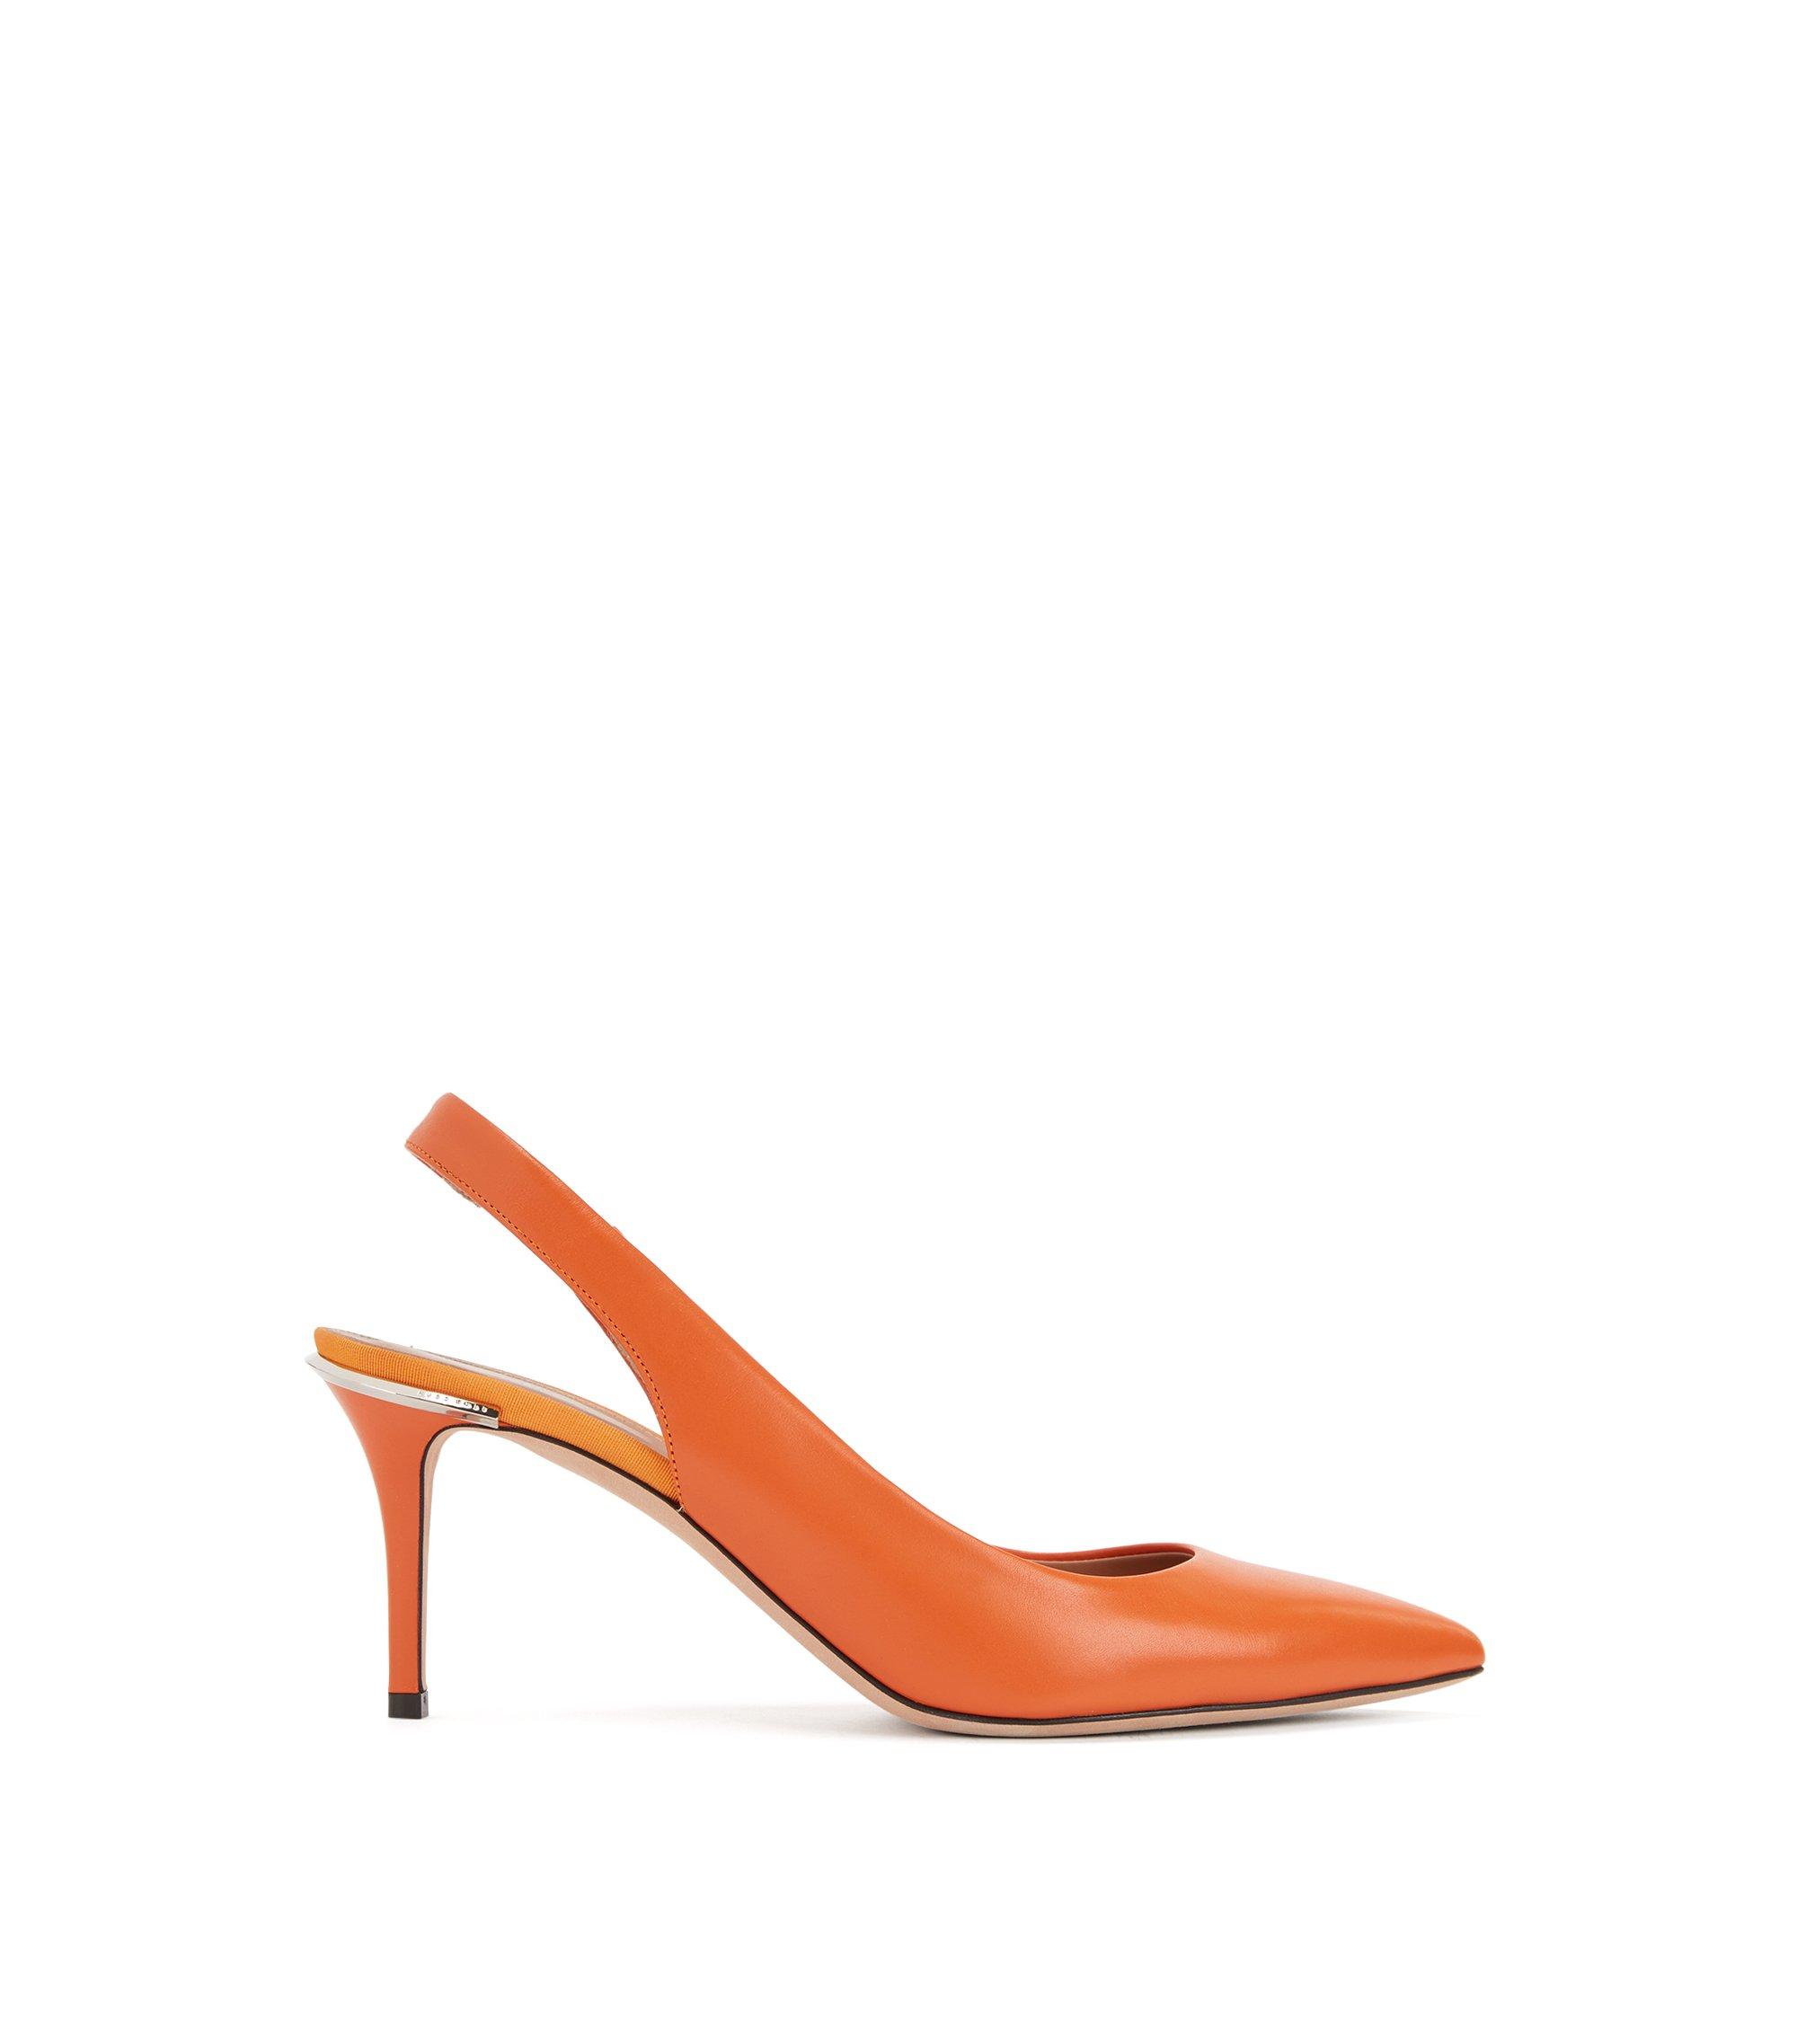 Italian calf-leather pumps with metal-trimmed heel, Orange